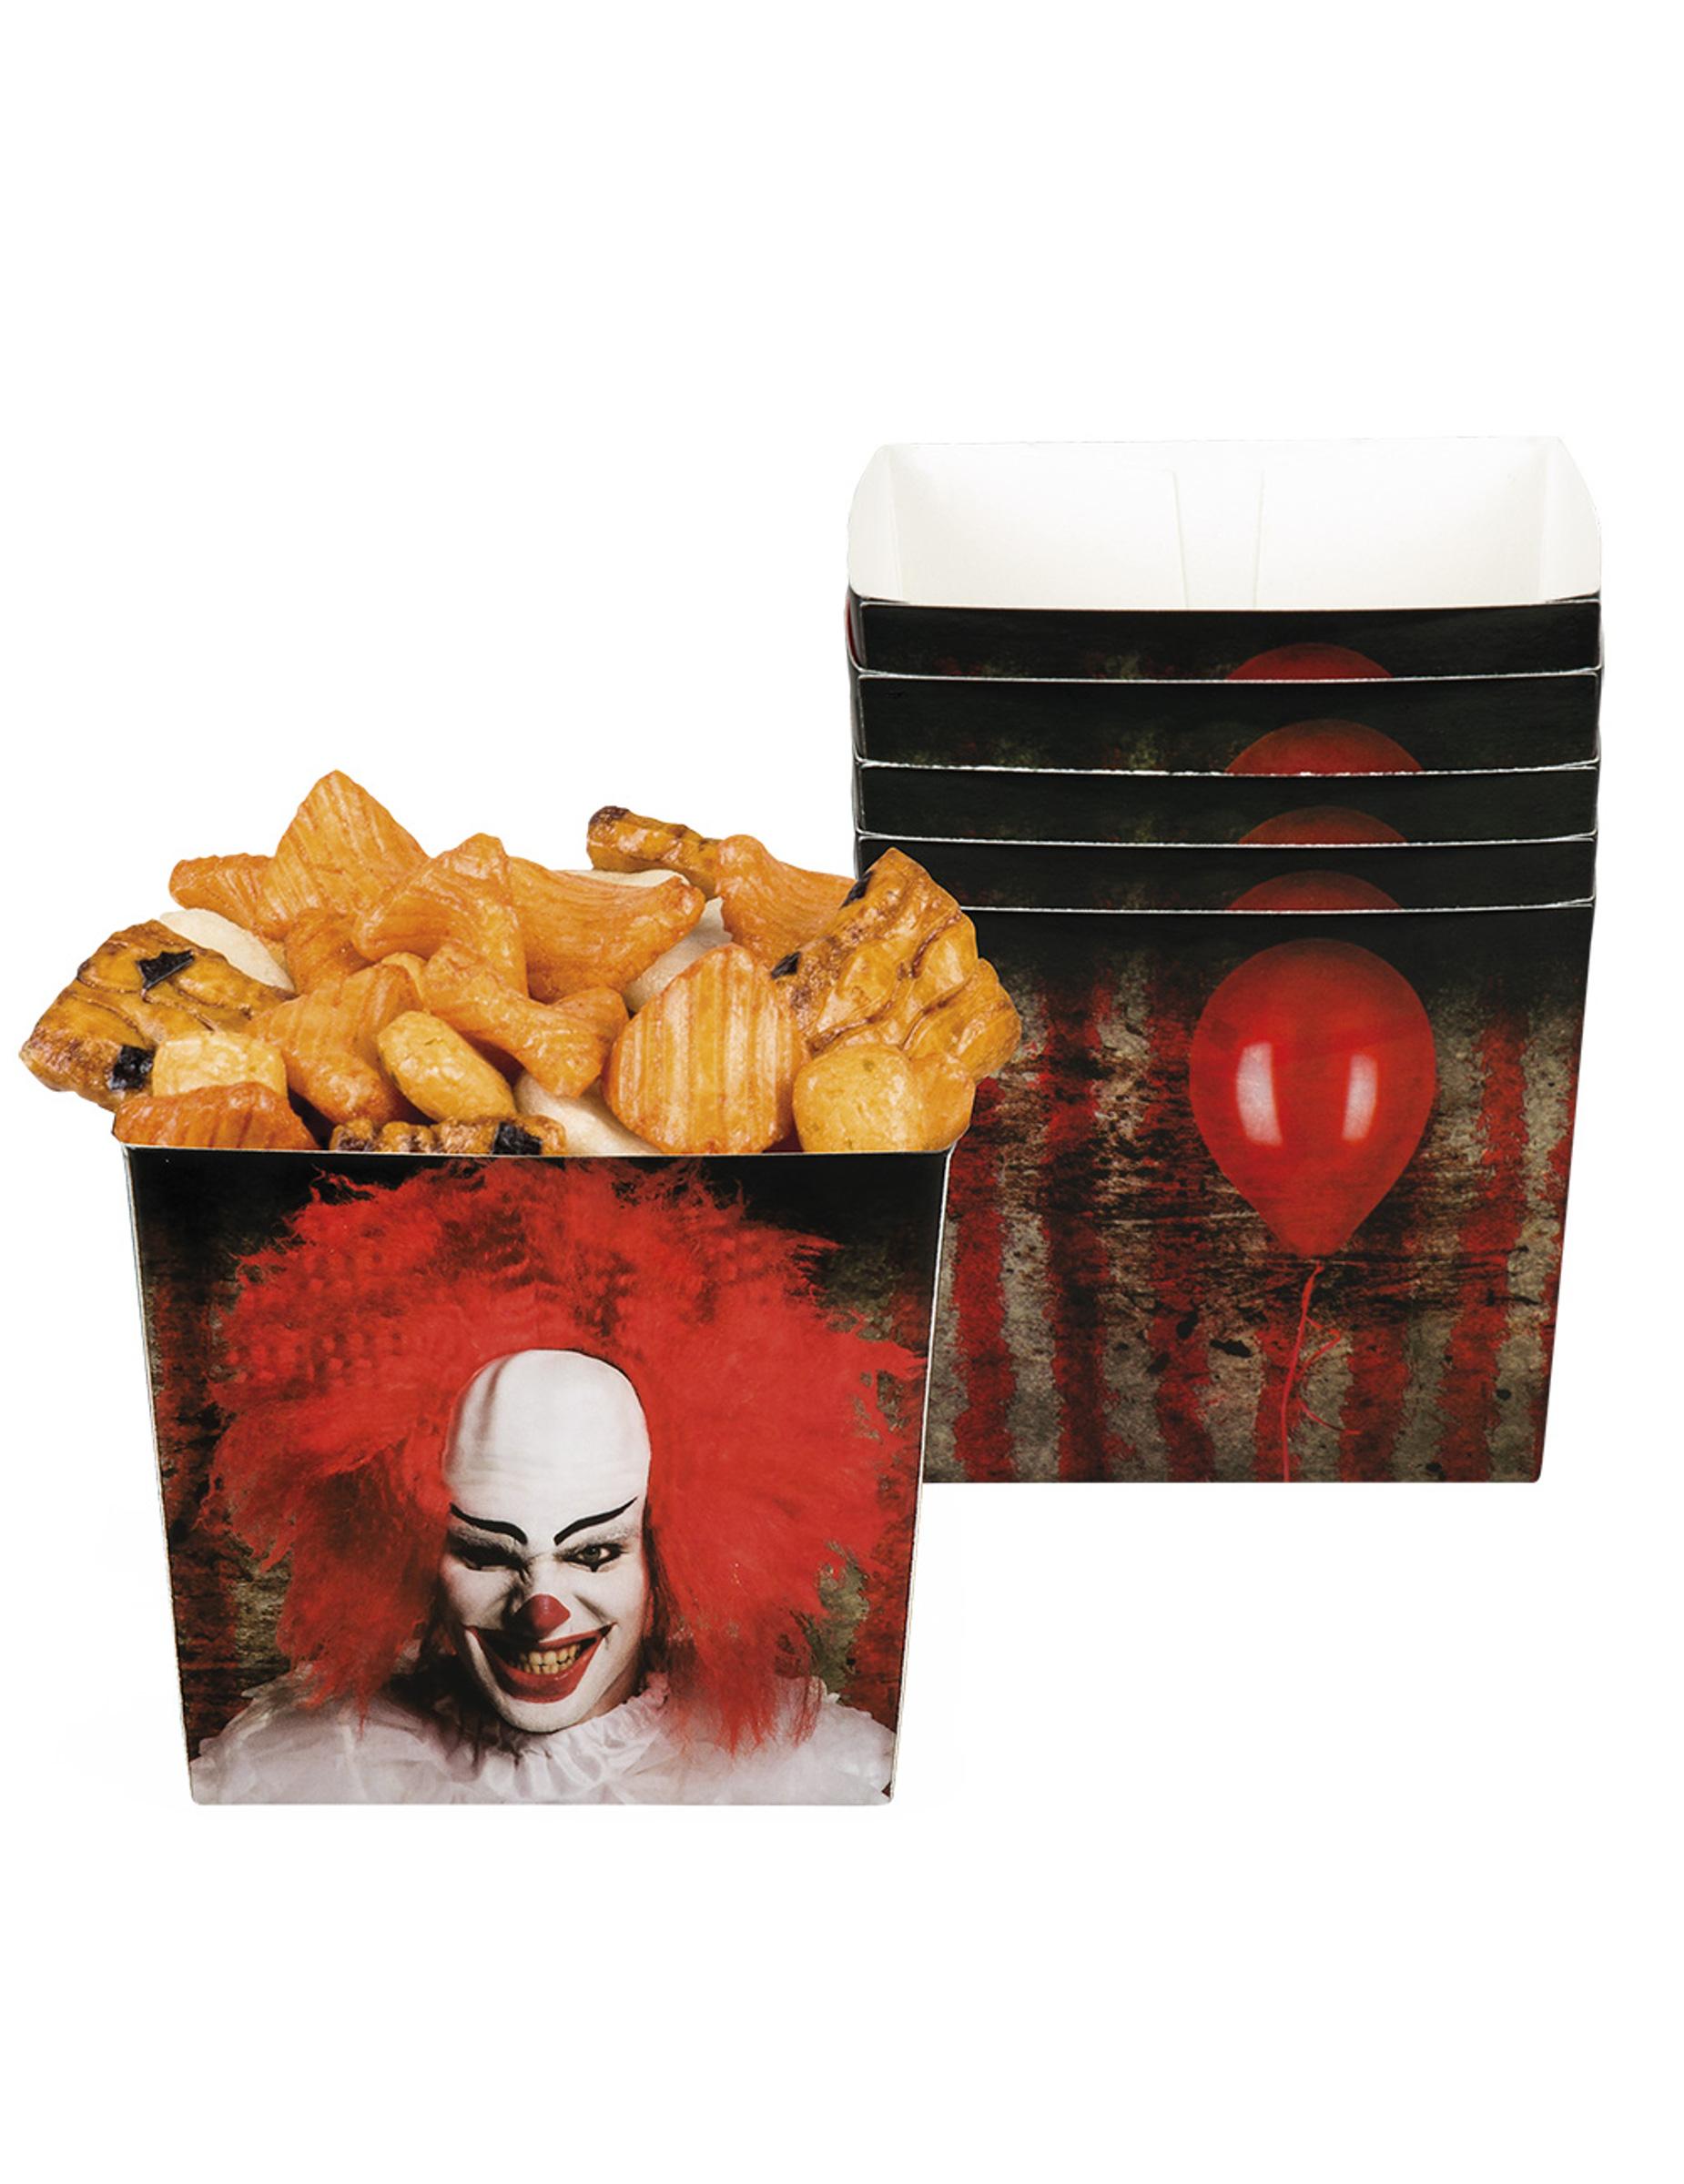 Horrorclown Behalter Tischdekoration Halloween 6 Stuck Rot Weiss